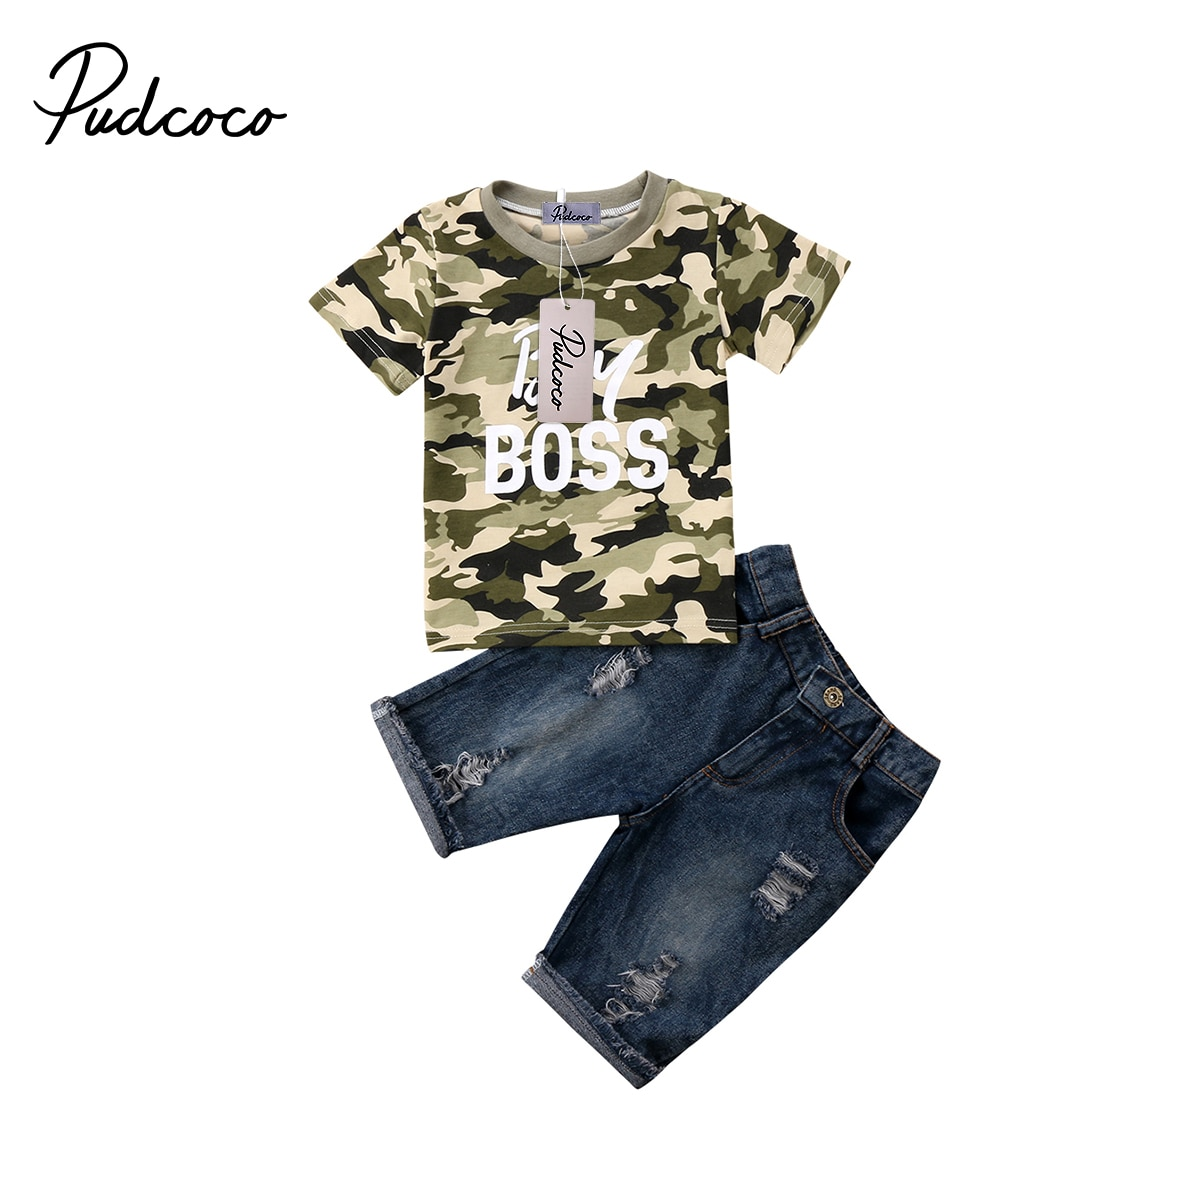 2018 marke Neue Kleinkind Infnat Kind Baby Jungen Kleidung T Shirt Camo Tops Denim Hosen Outfits 2Pcs Set Kinder sommer Kleidung 1-6T